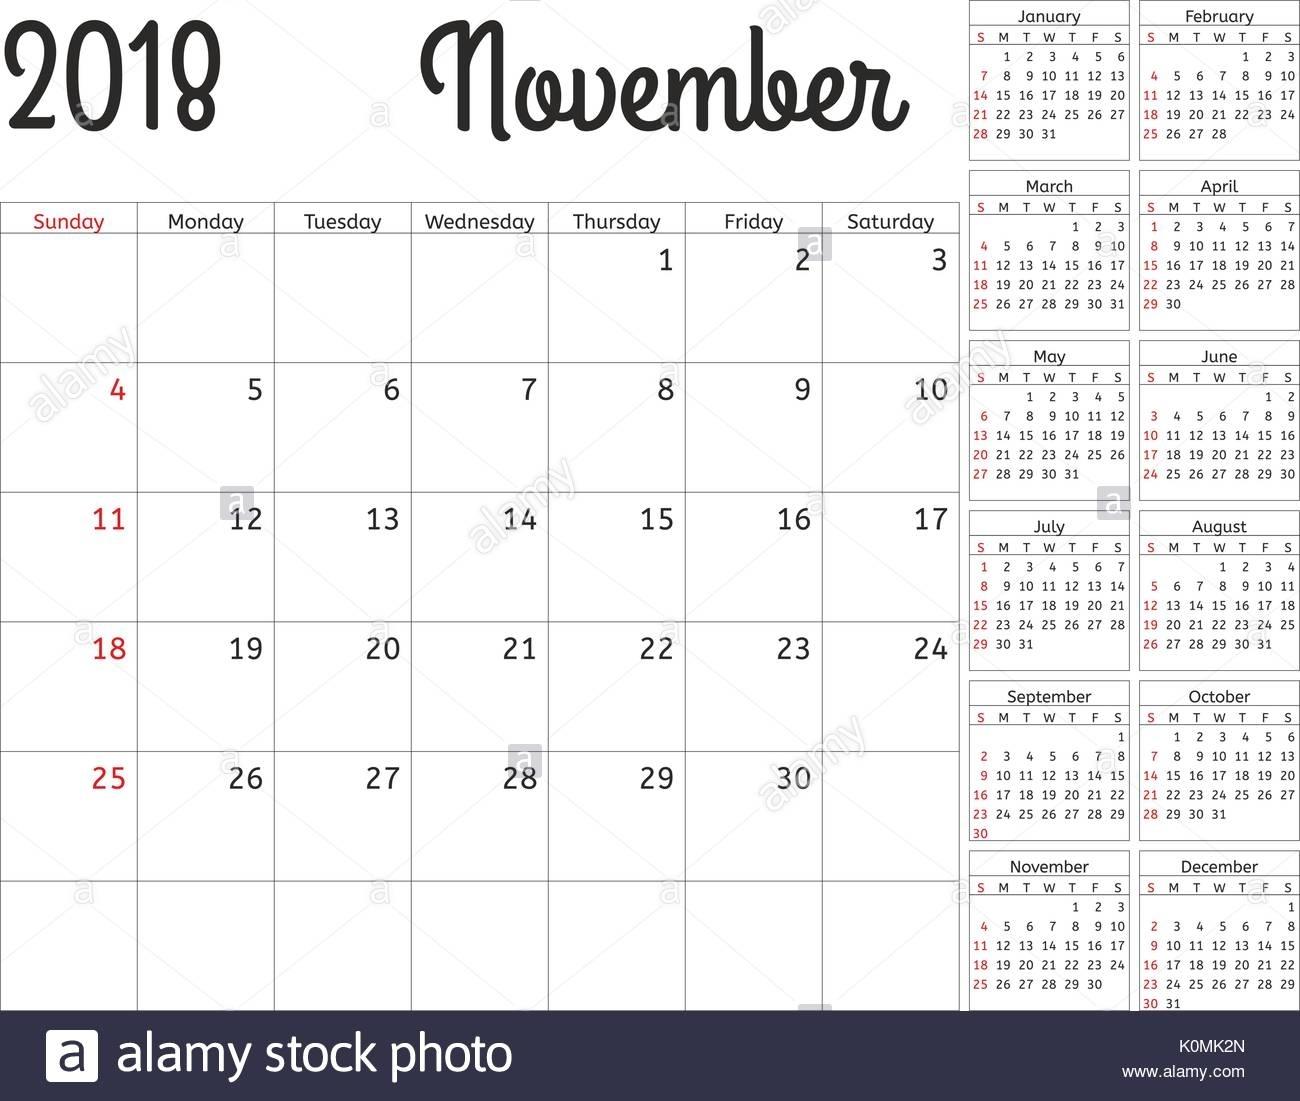 November Calender Stock Photos & November Calender Stock Images - Alamy regarding Medroxyprogesterone Perpetual Calendar 12-14 Weeks